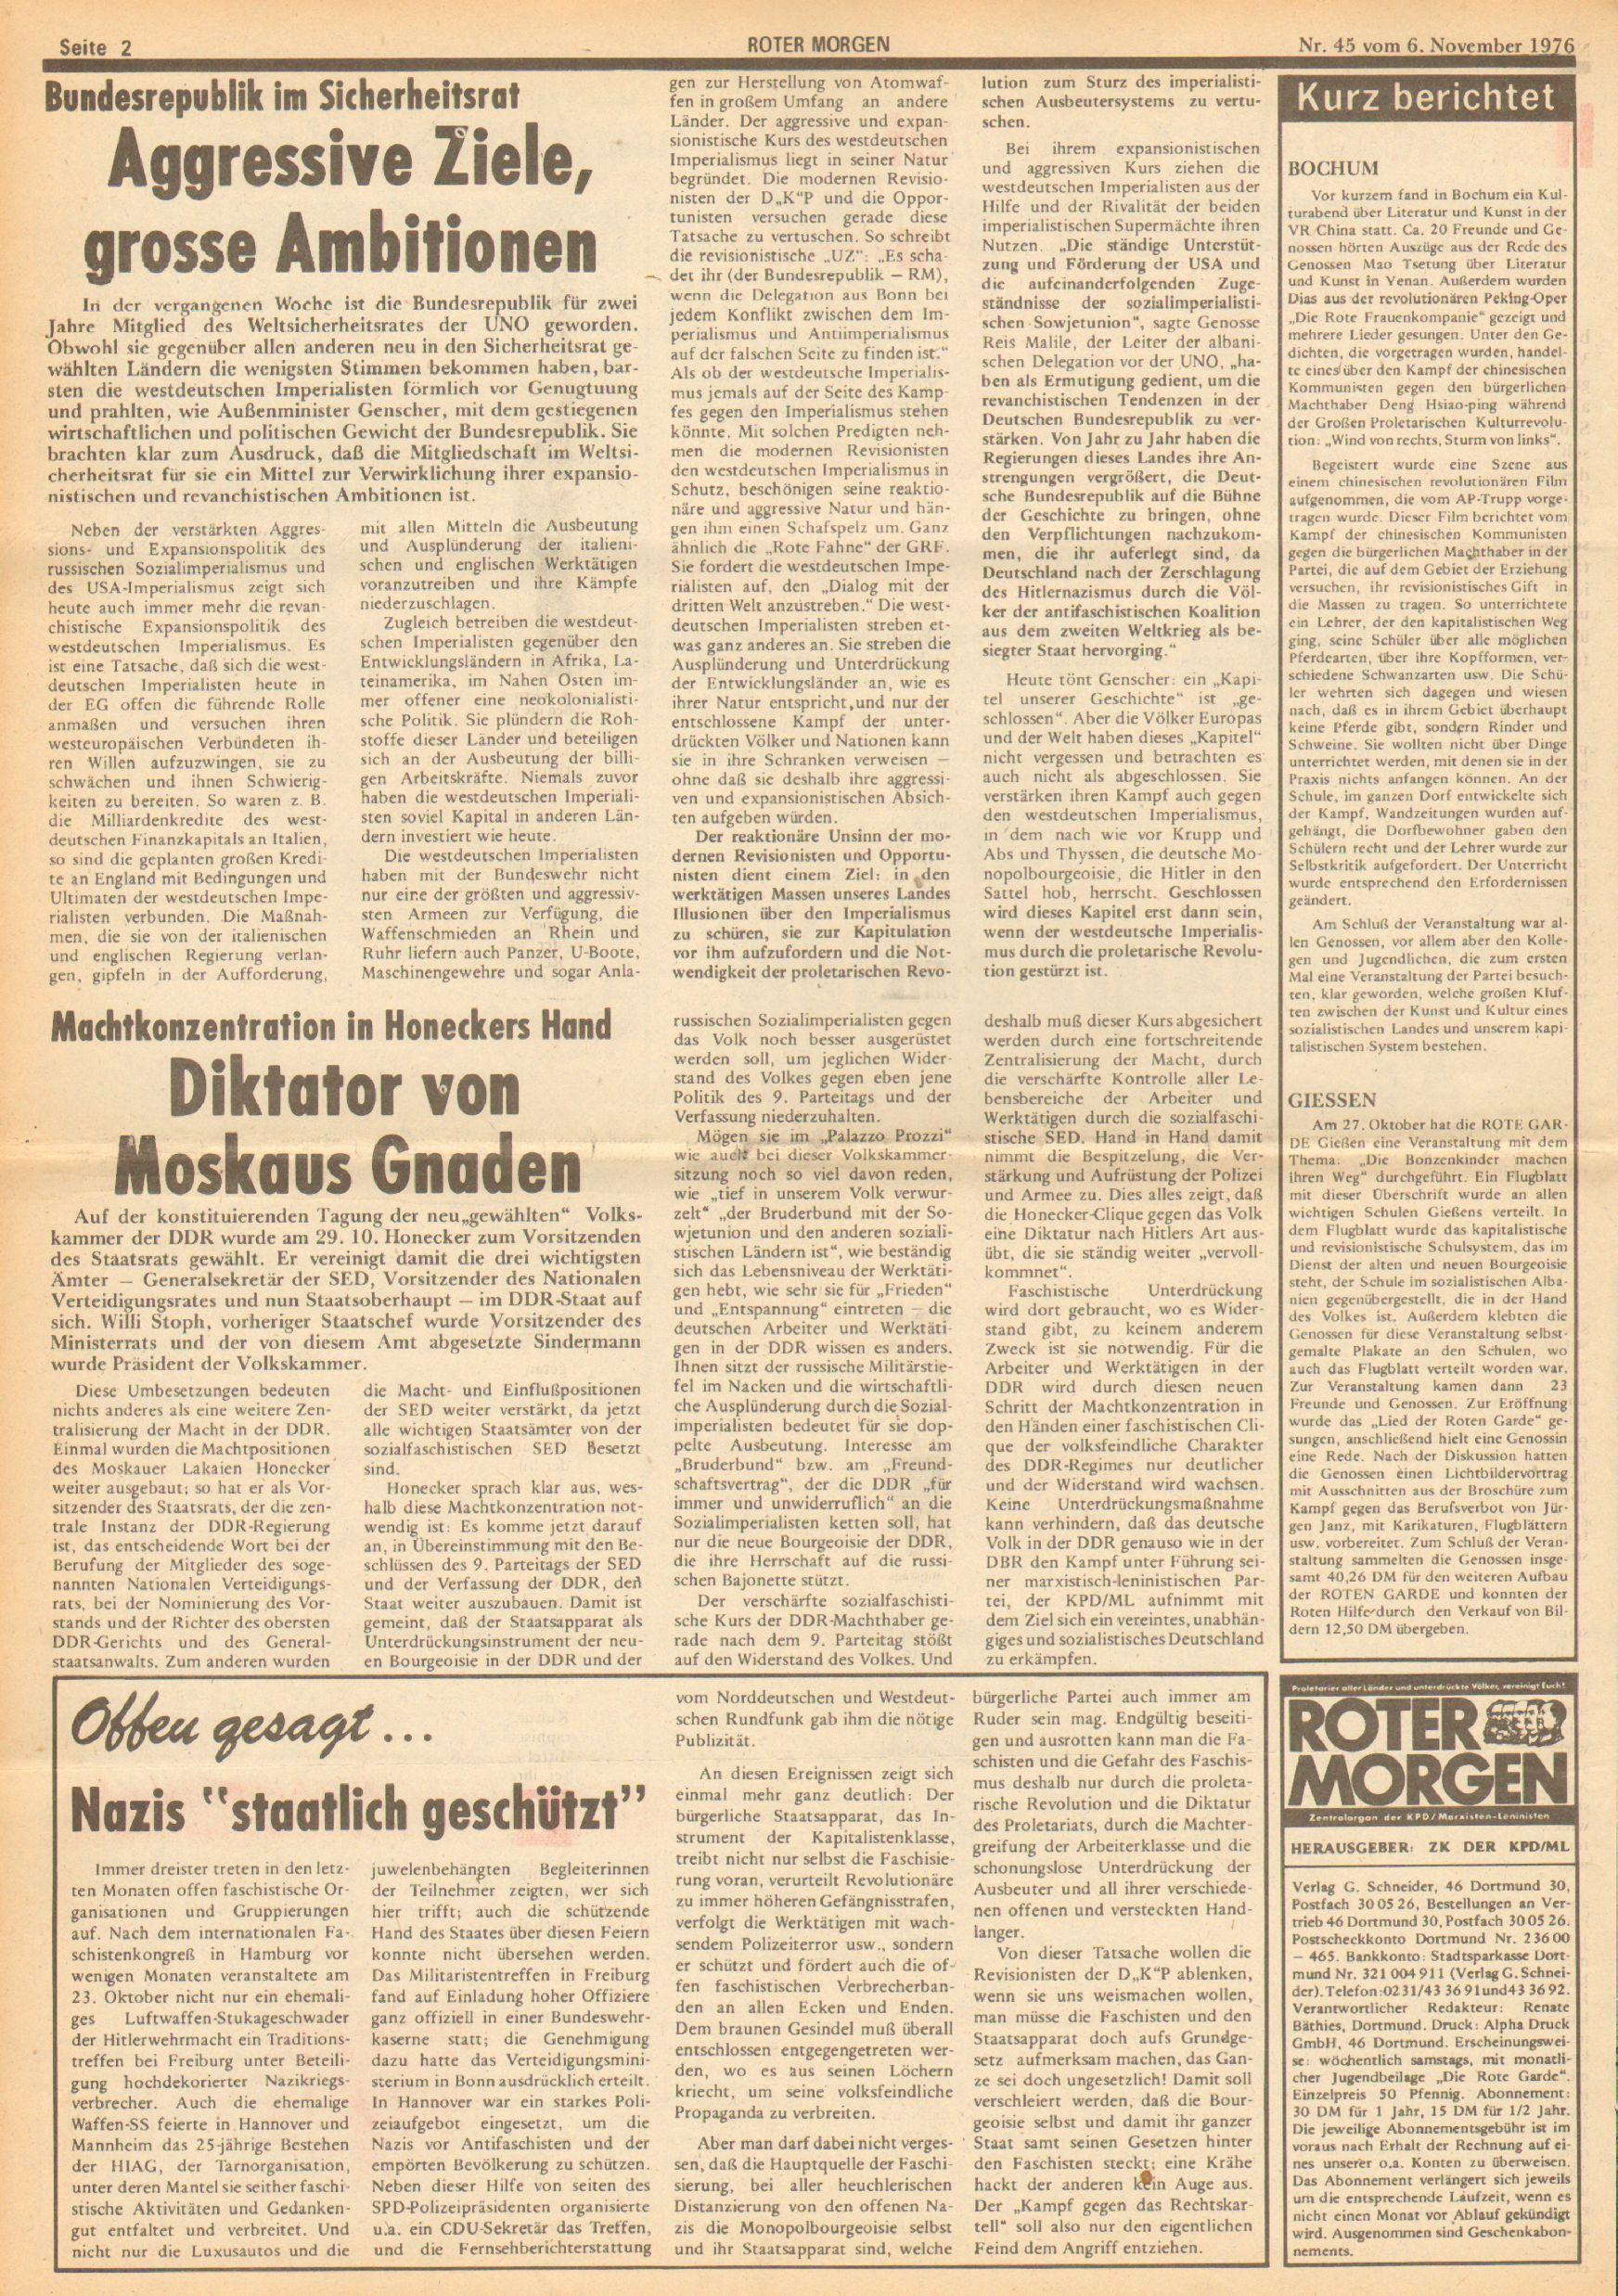 Roter Morgen, 10. Jg., 6. November 1976, Nr. 45, Seite 2